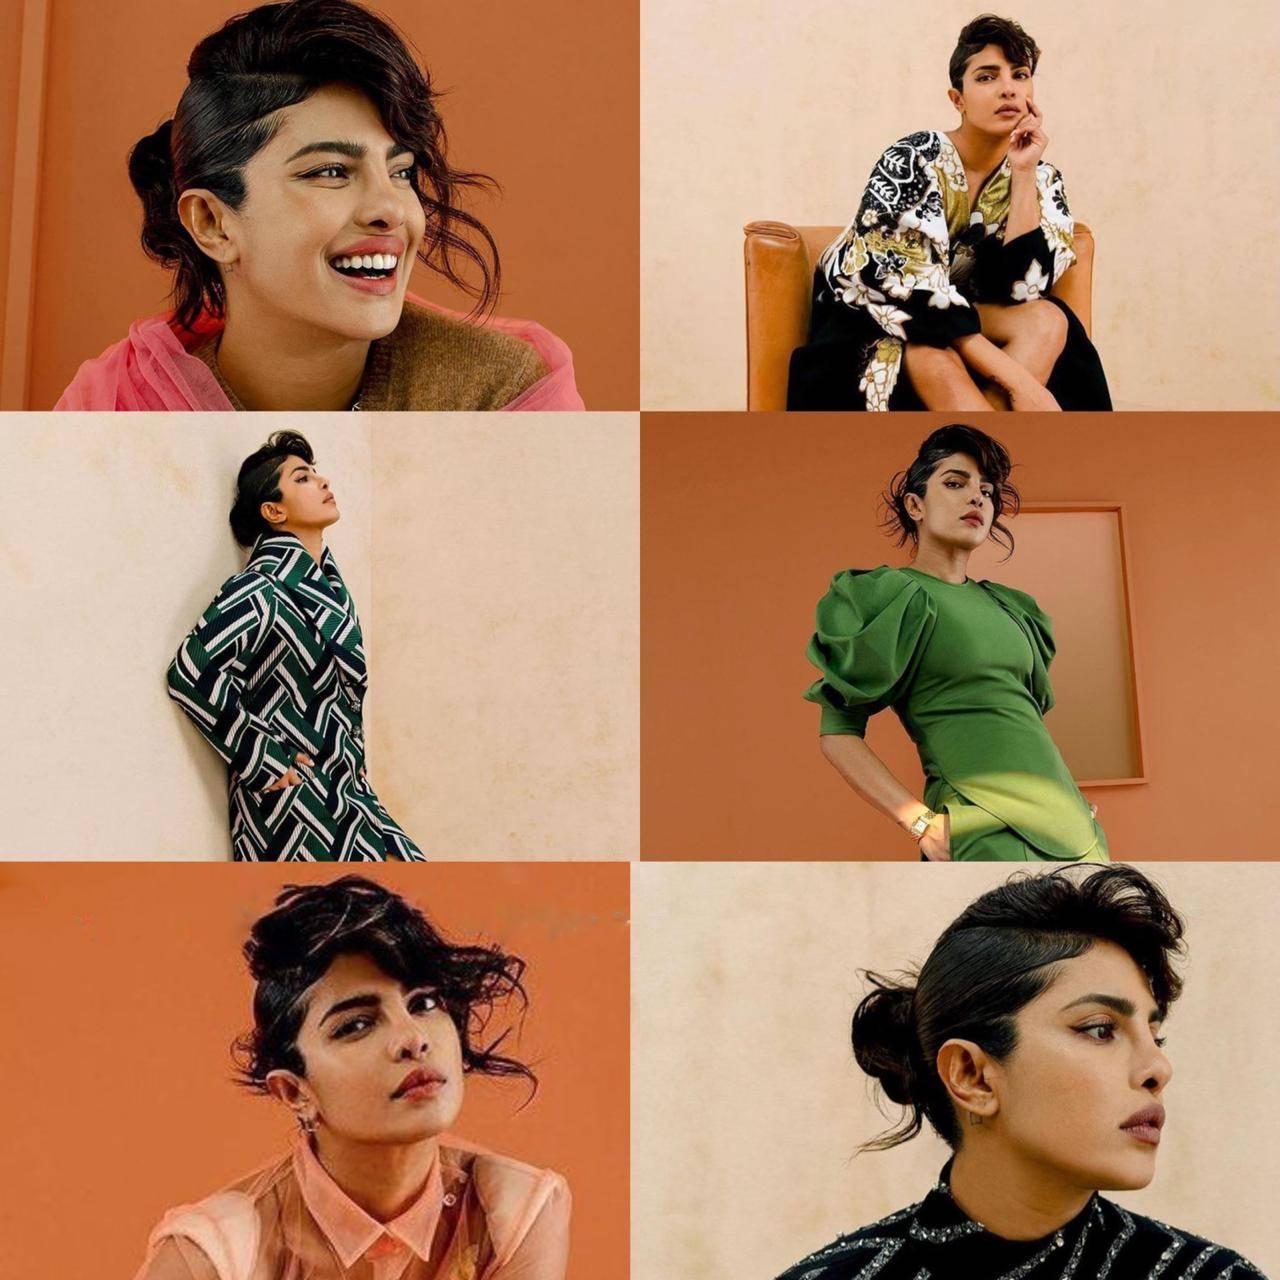 Priyanka Chopra Jonas's Stunning Looks From Her Latest Photoshoot Is Breaking the Internet